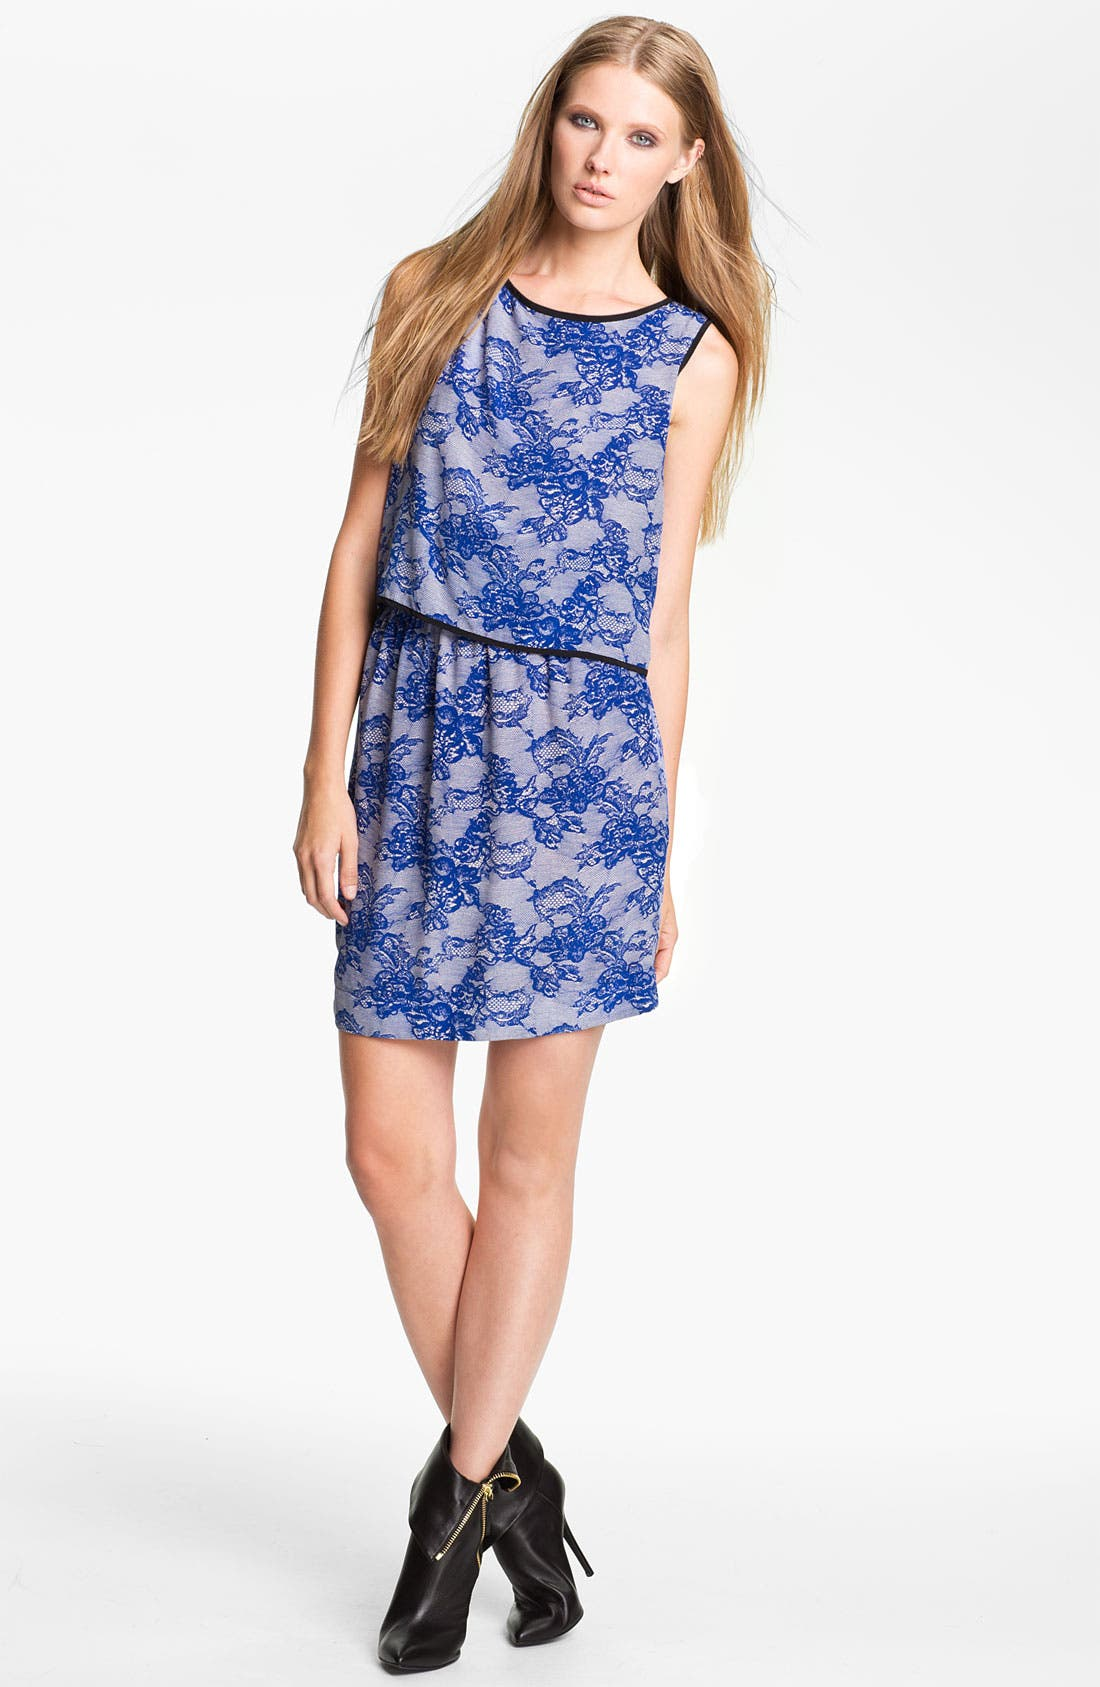 Alternate Image 1 Selected - Cut25 Lace Print Dress